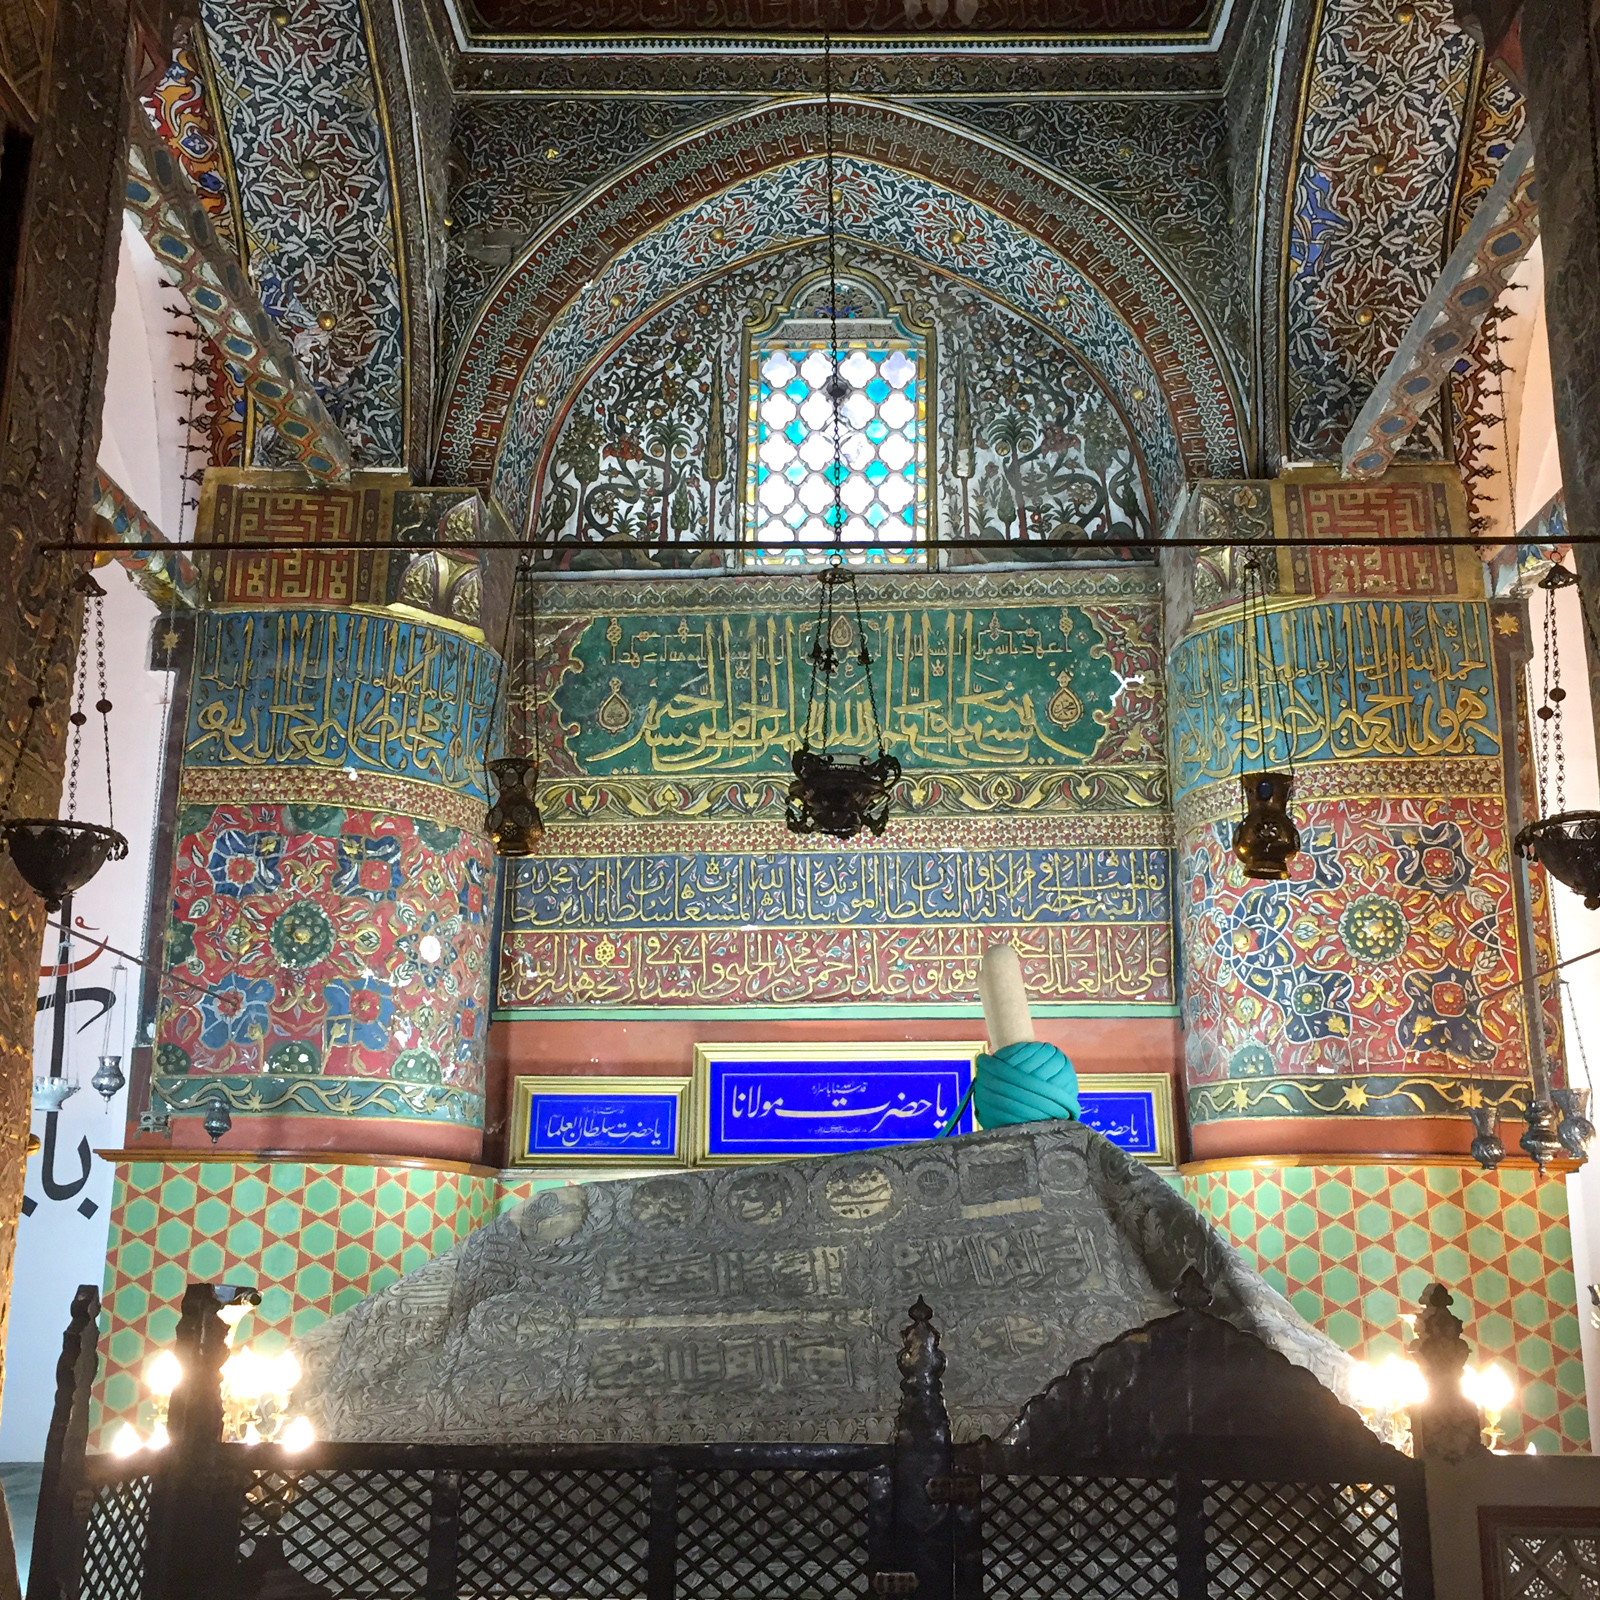 Rumi's remains at Mevlana Museum